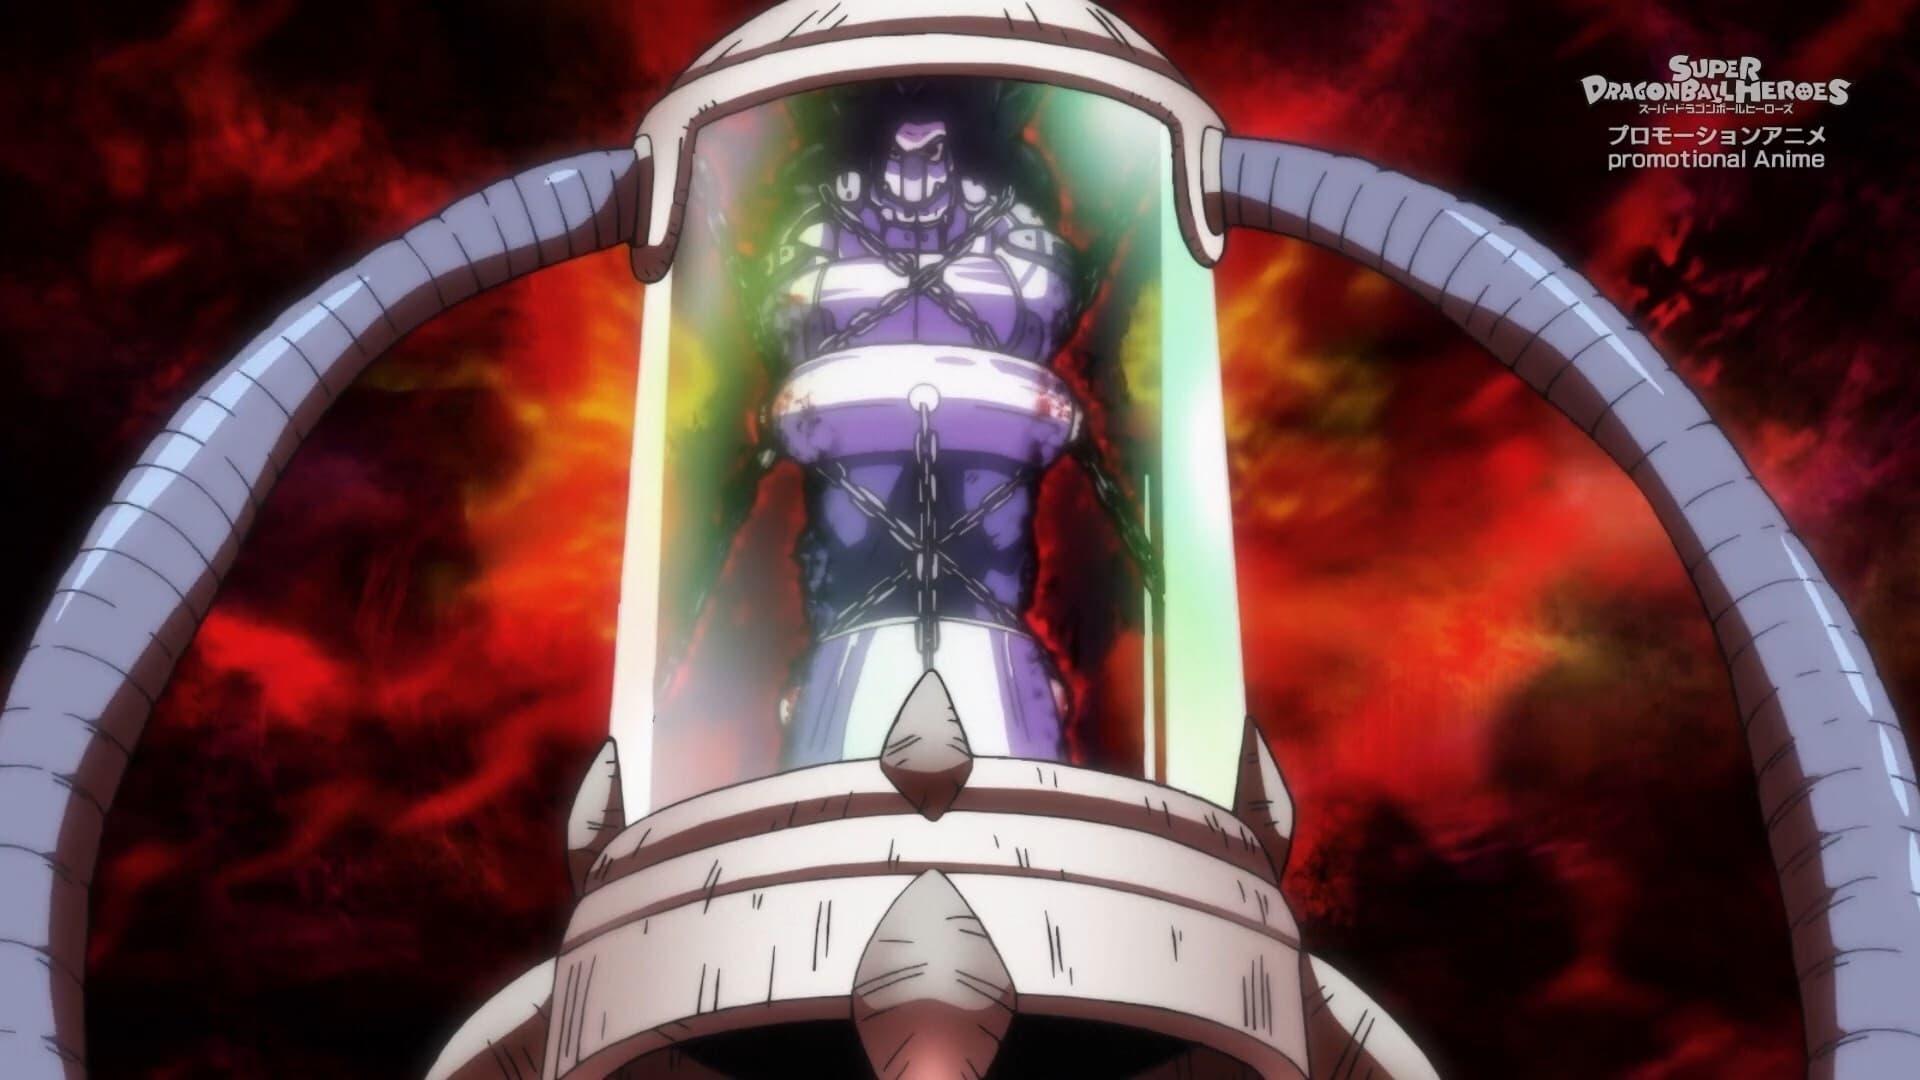 Super Dragon Ball Heroes Season 3 :Episode 7  Rampaging Terror! The Return of Evil Aura!